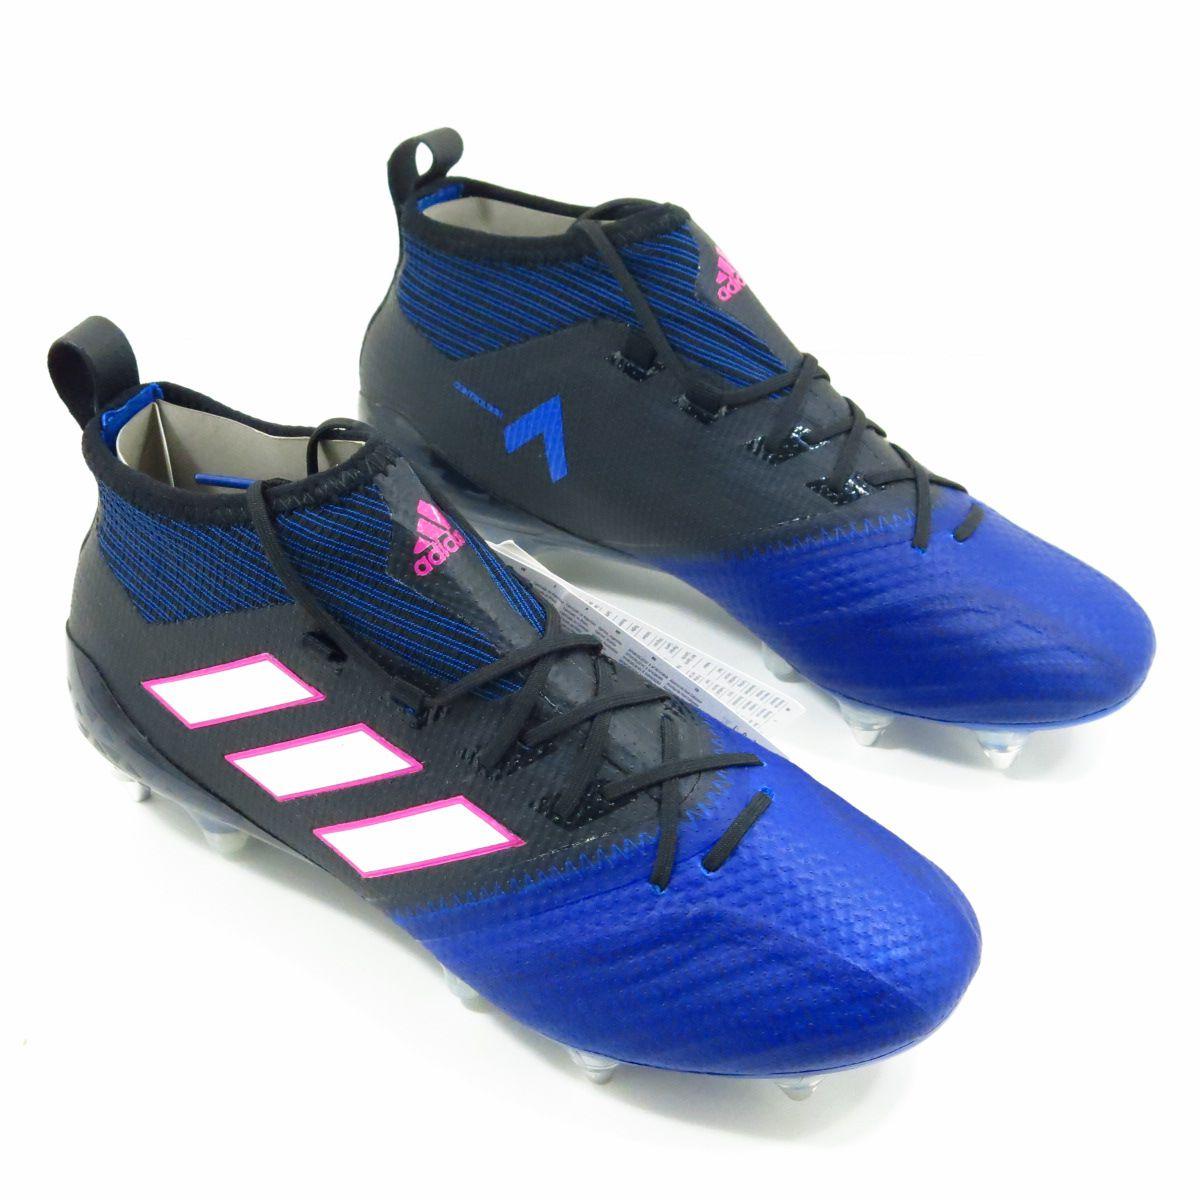 Chuteira Adidas Ace 17.1 Primeknit SG - Trava Mista